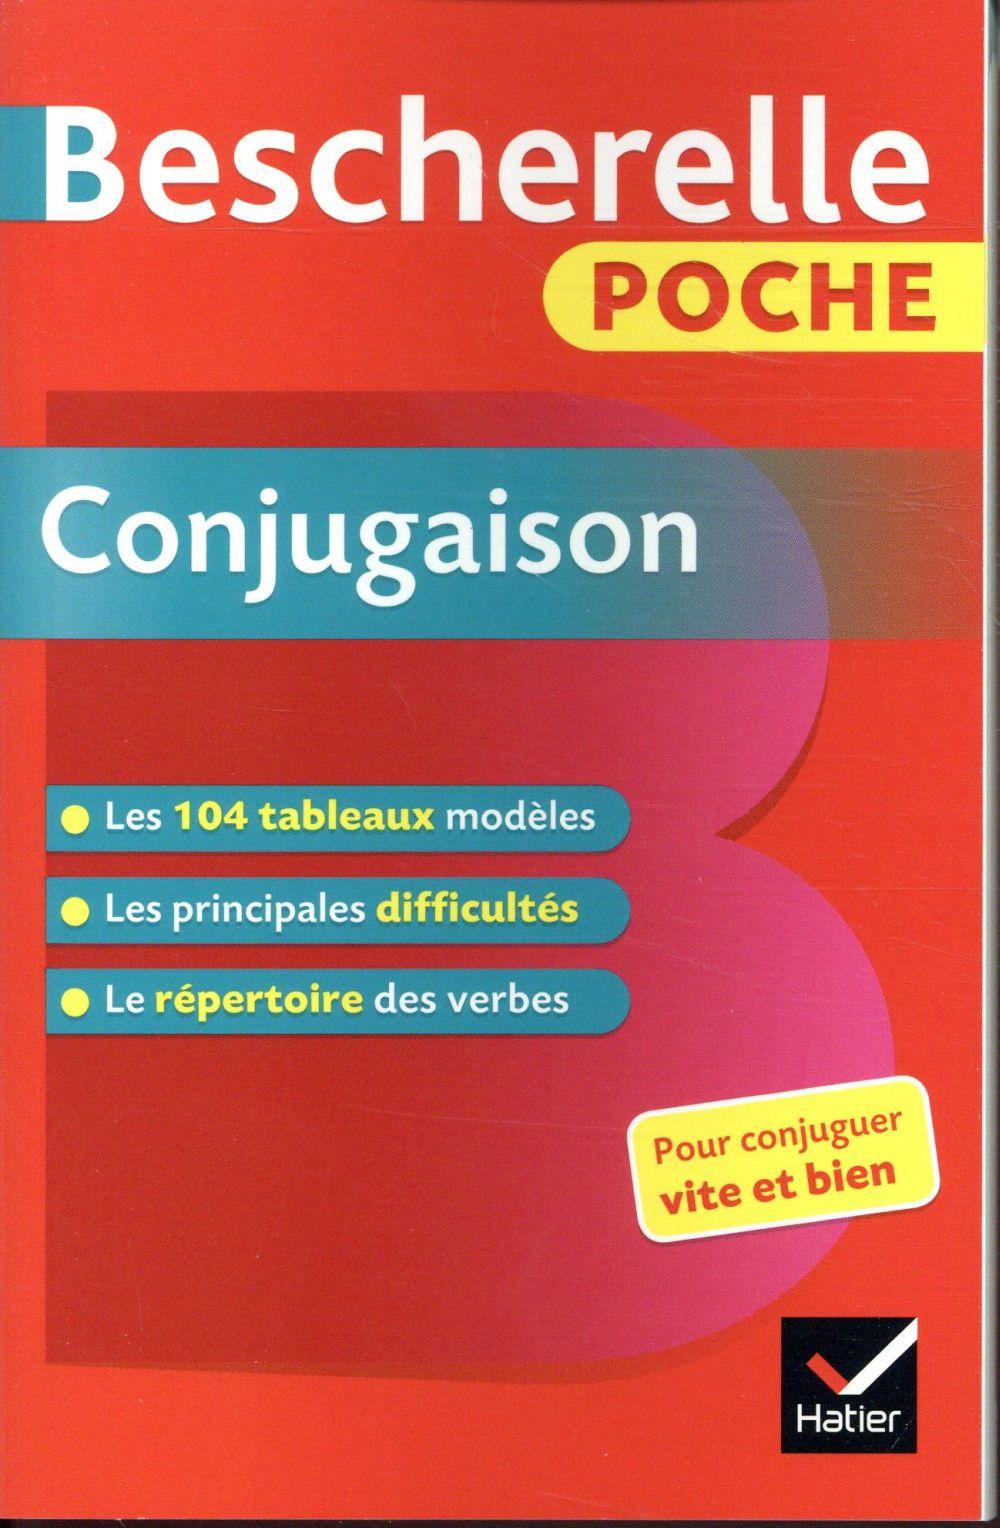 XXX - BESCHERELLE  -  POCHE CONJUGAISON